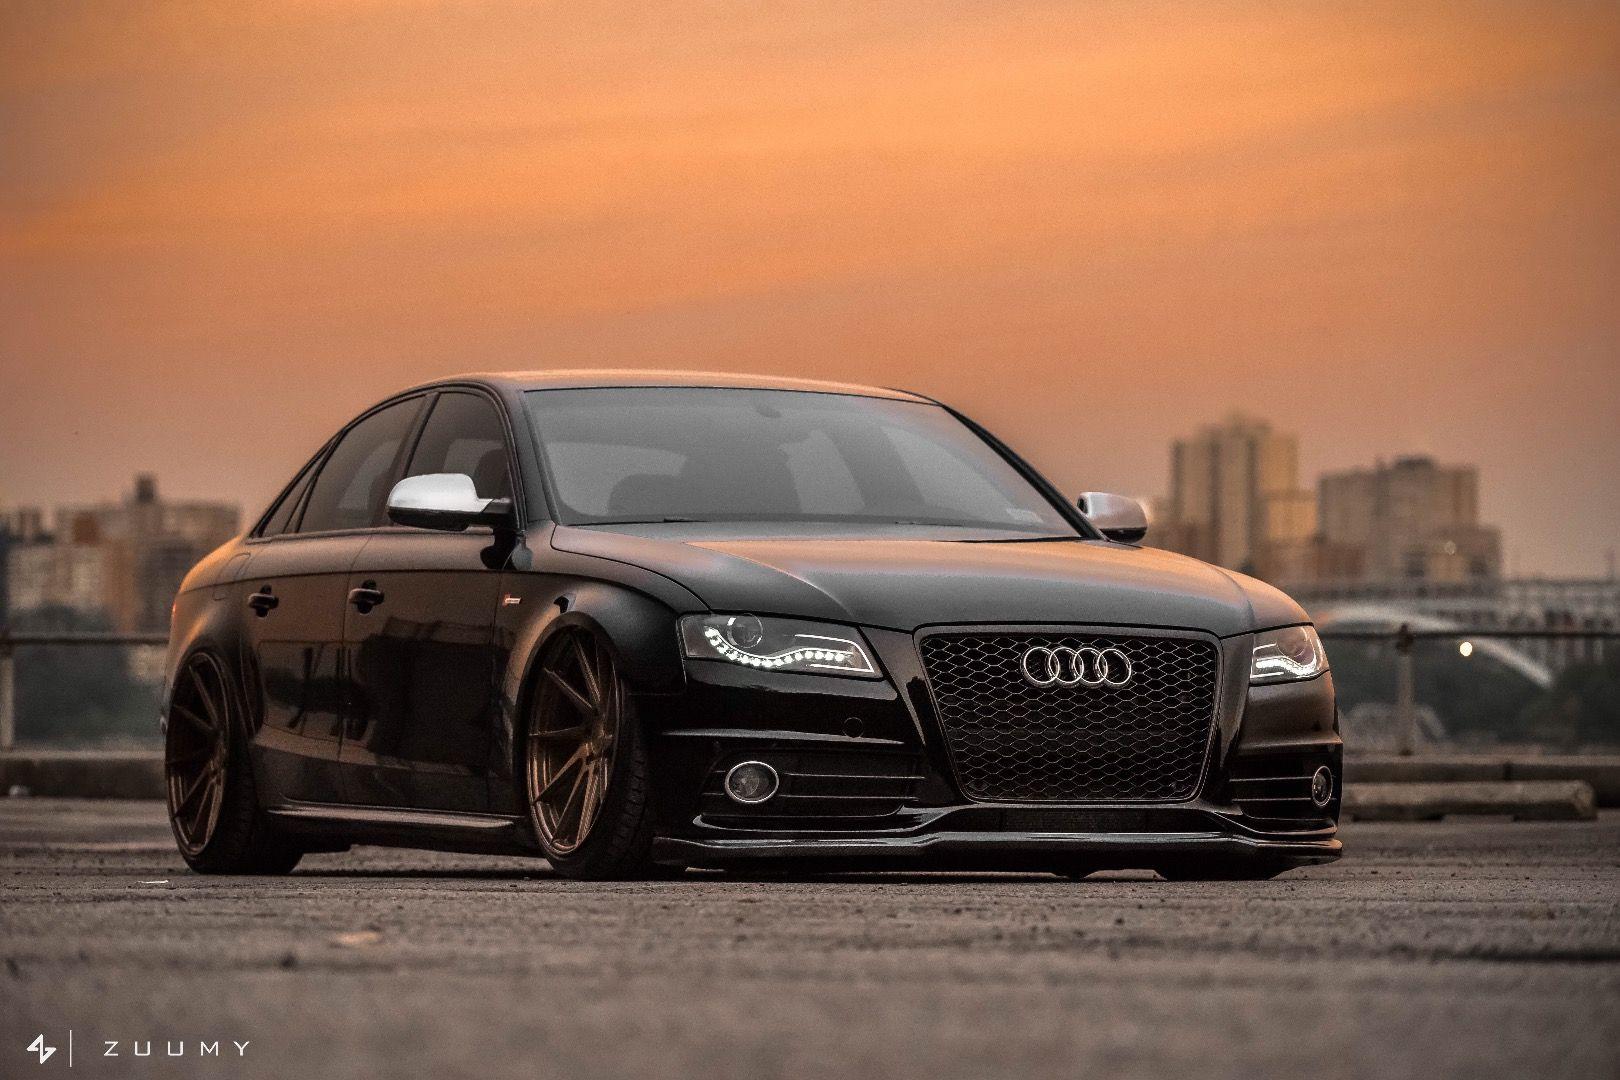 B8 S4 Modified Wheels Suspension Gallery Thread Page 86 Audi S4 Dream Cars Audi Audi